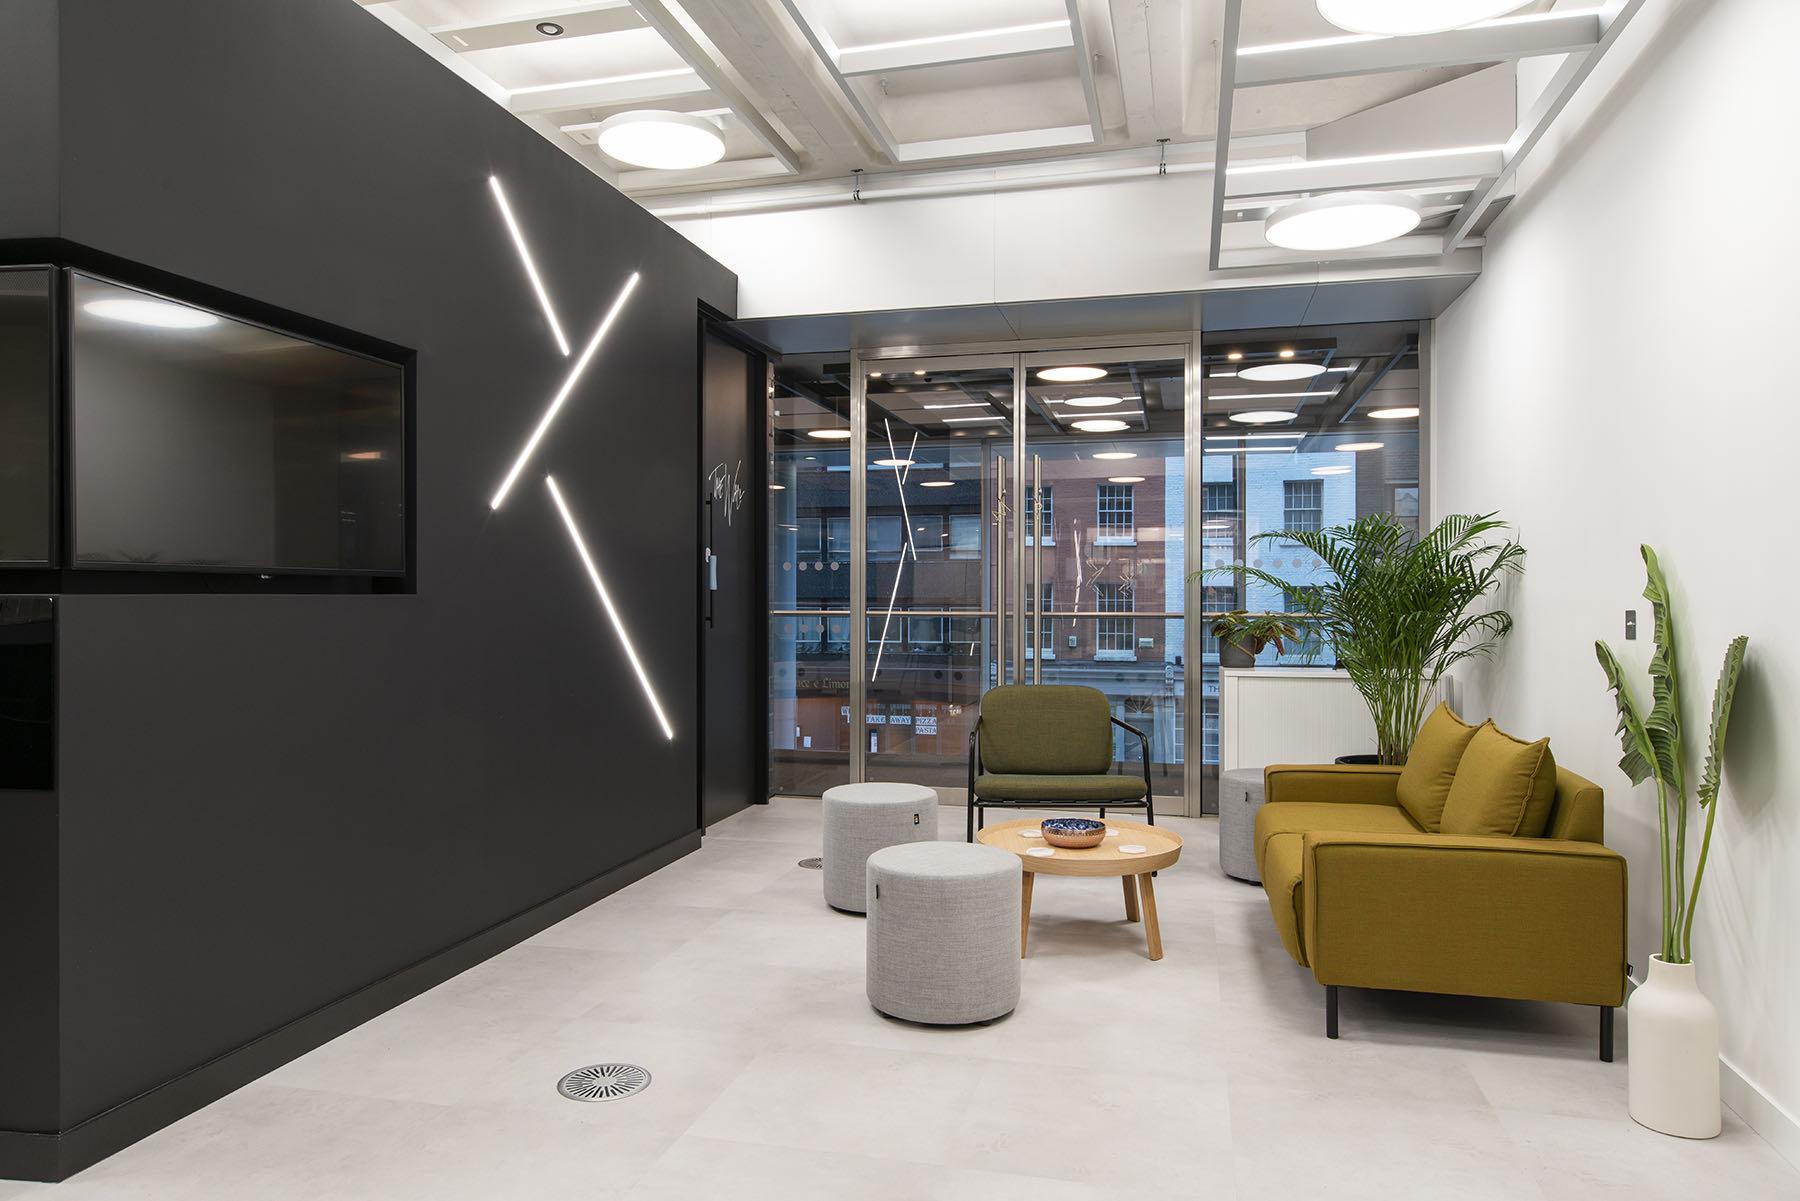 metapack-london-office-4